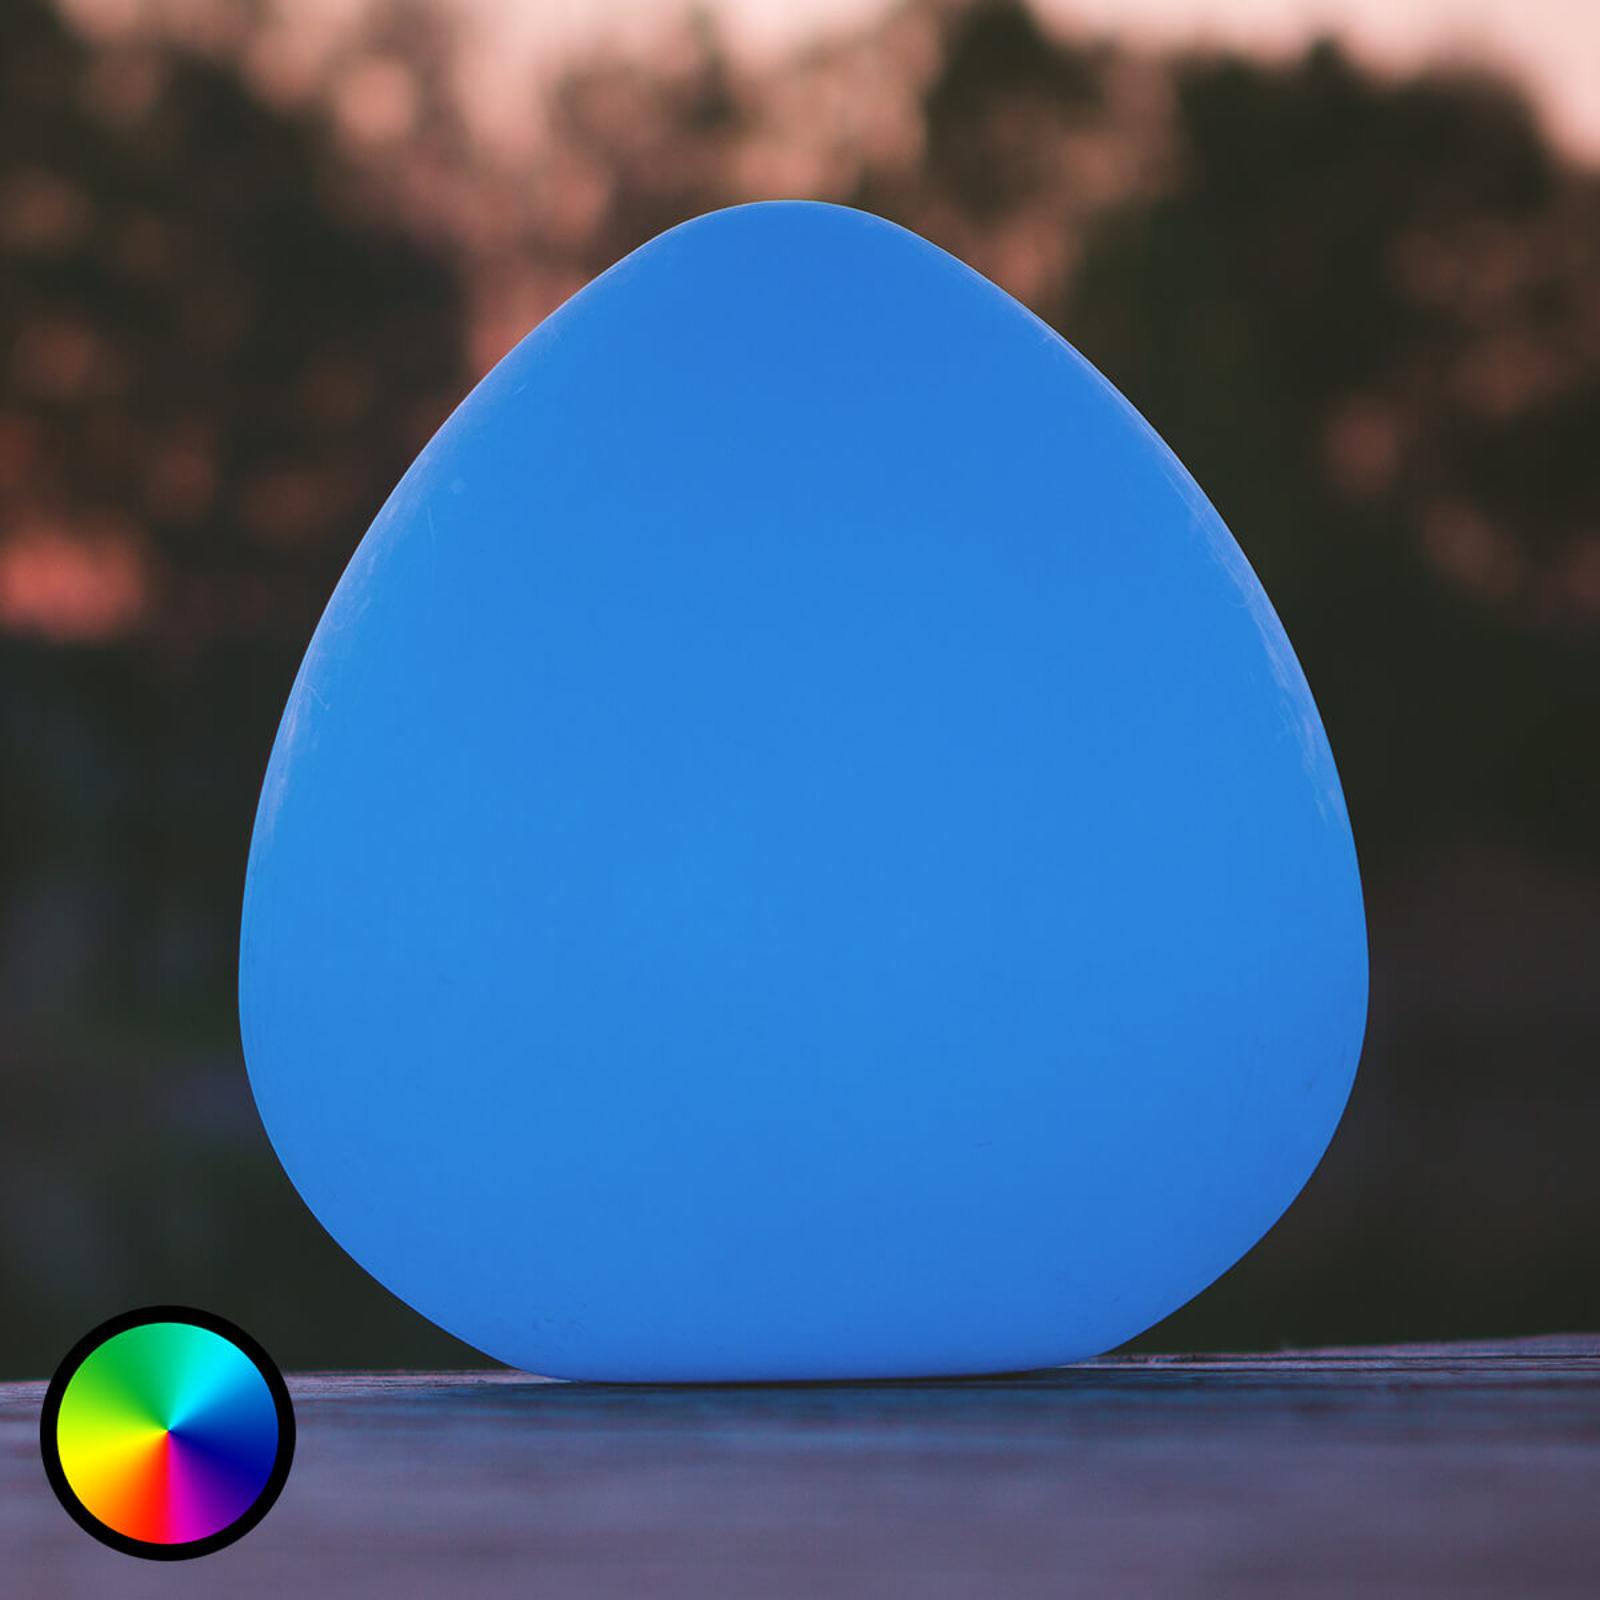 Stone L LED-dekorasjonsbelysning, styrbar via app